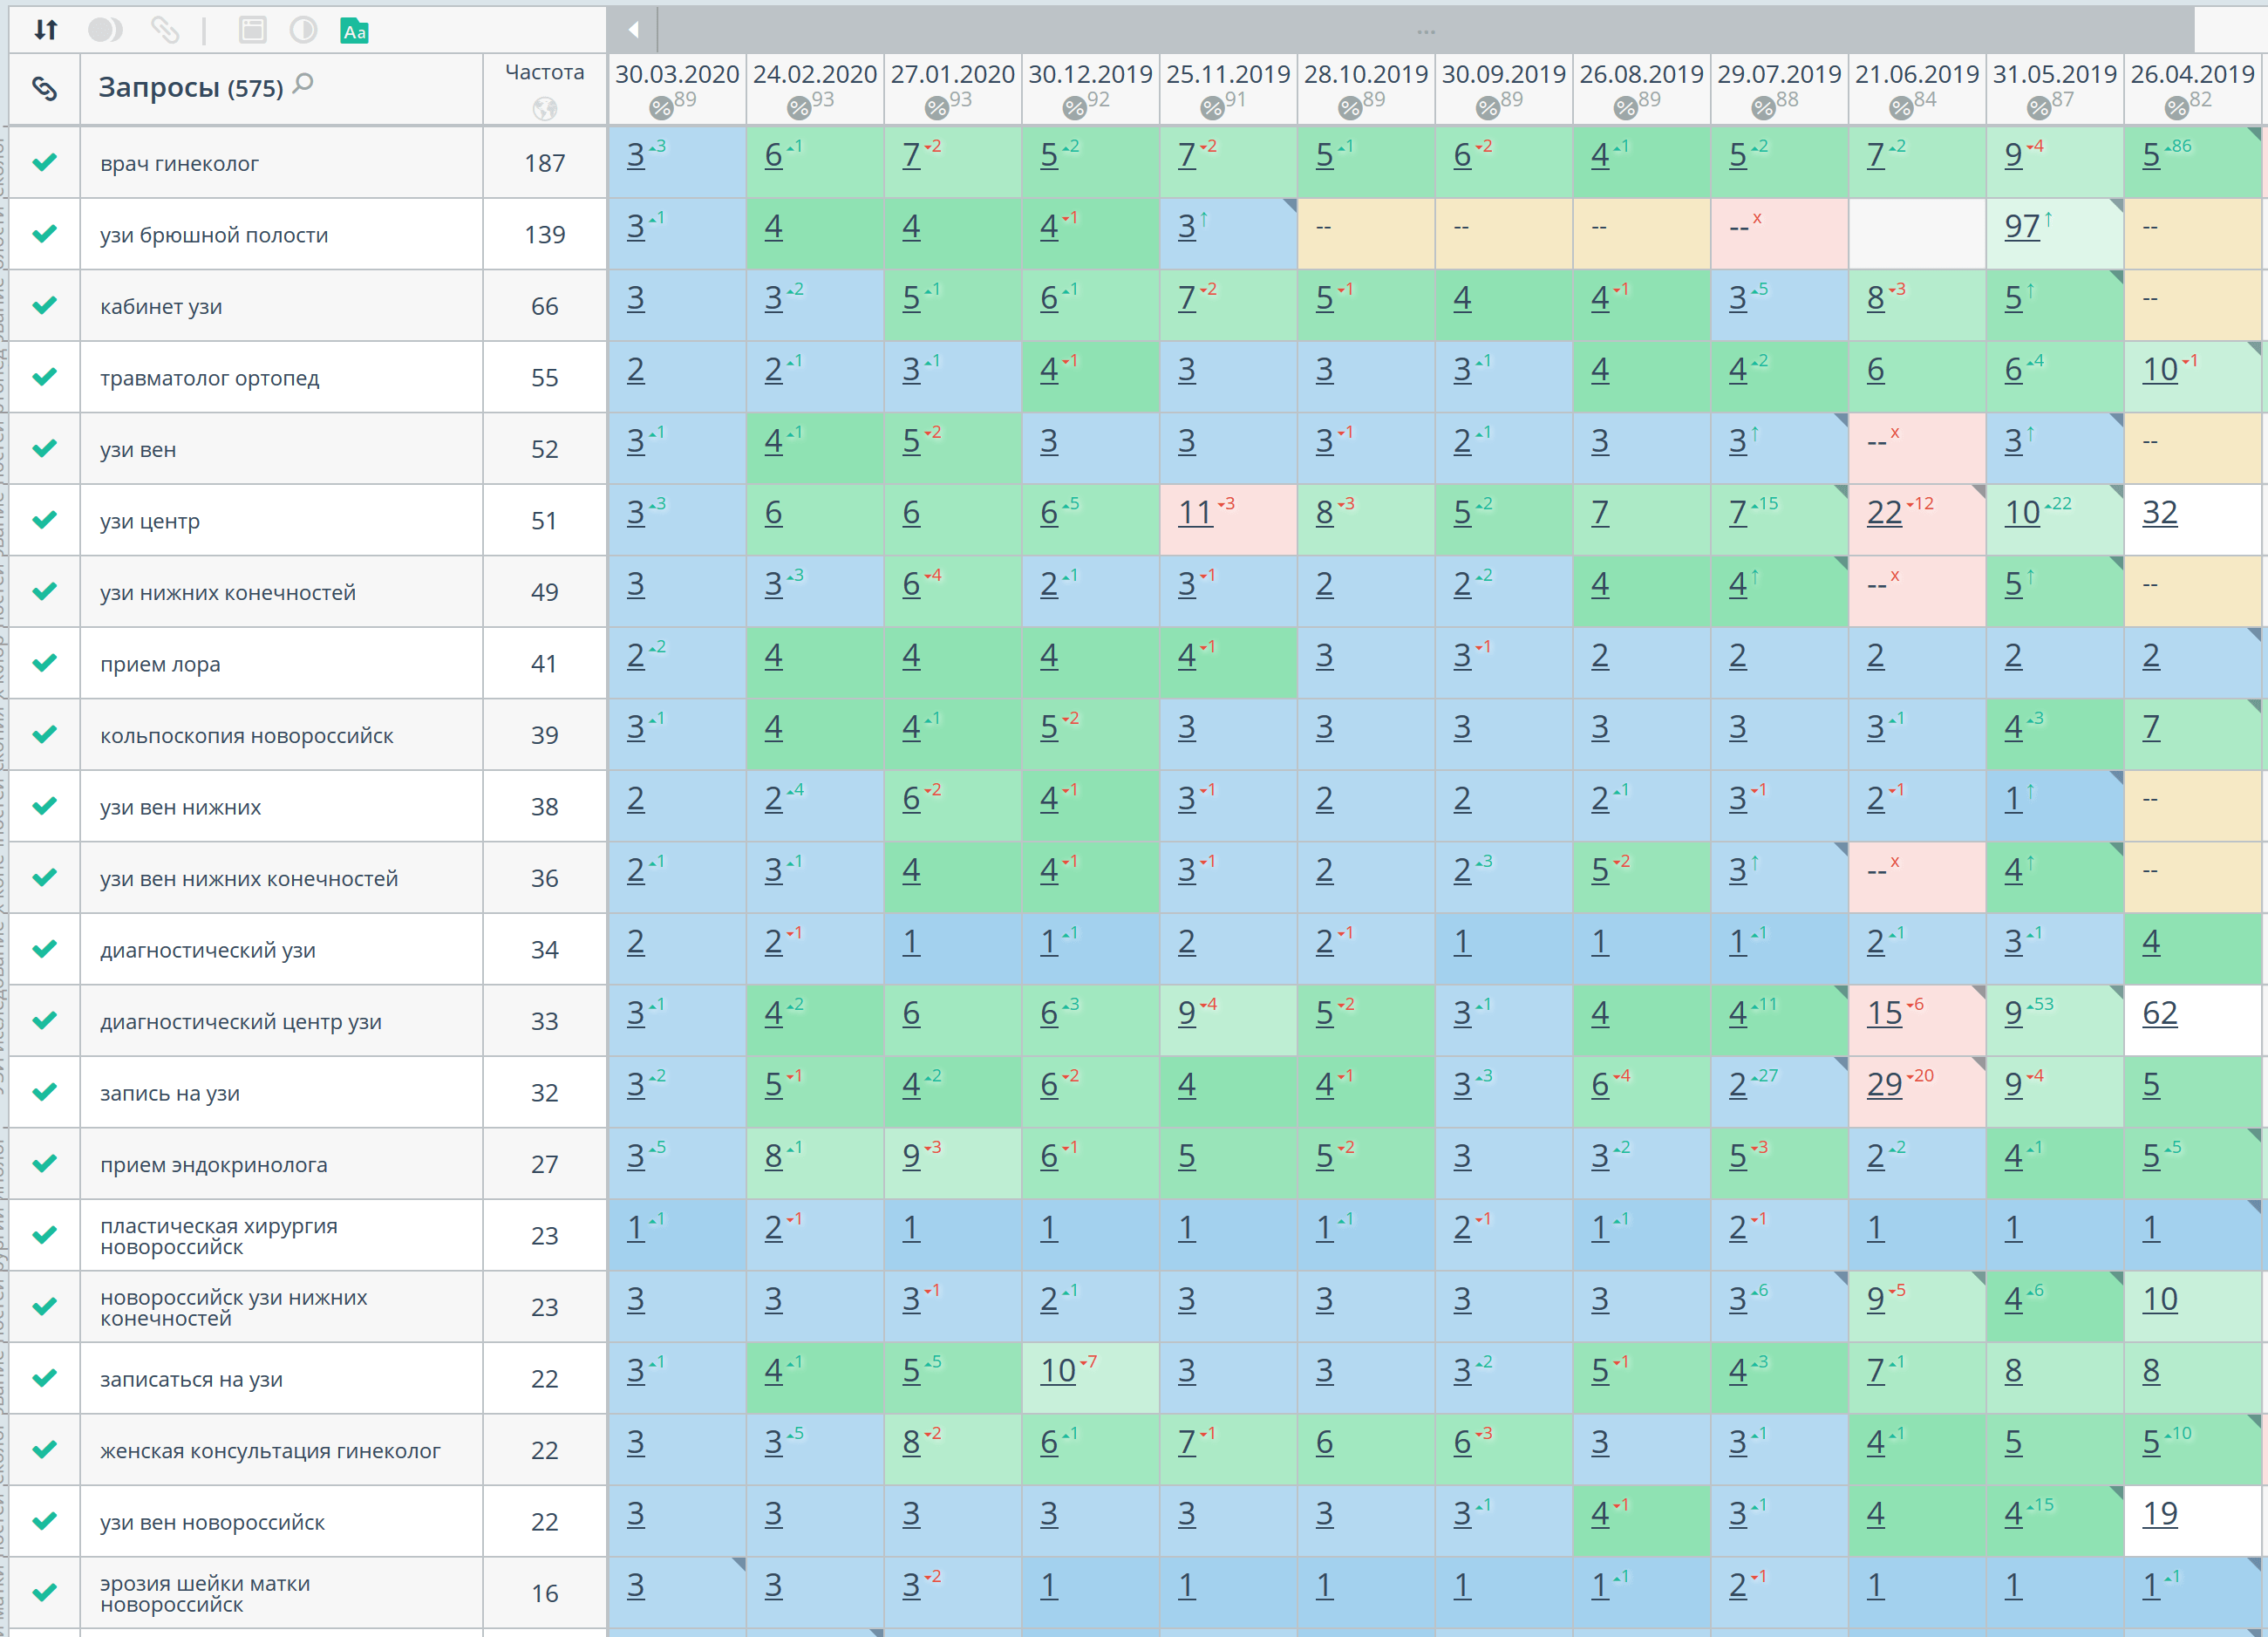 Статистика позиций по Яндексу, регион Новороссийск